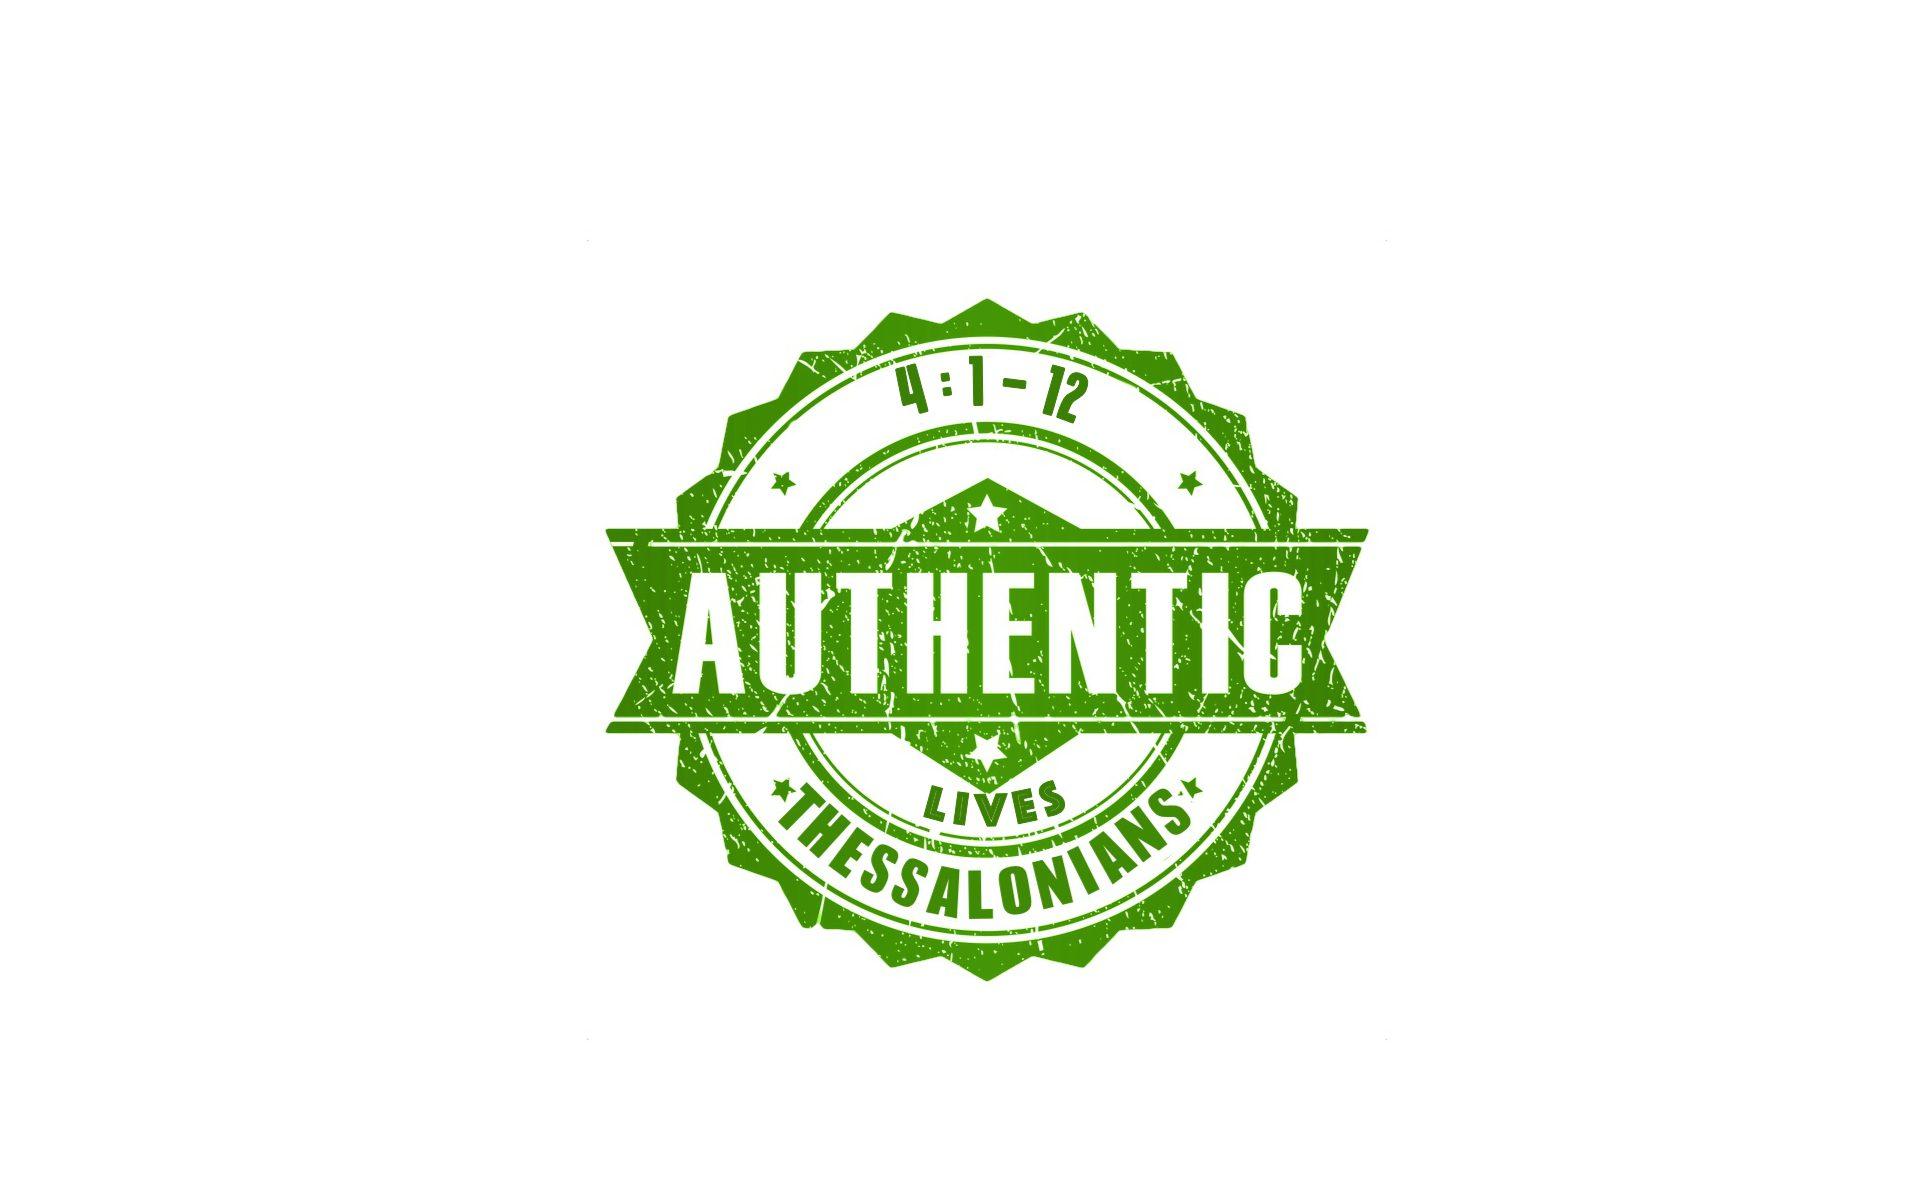 Authentic Lives